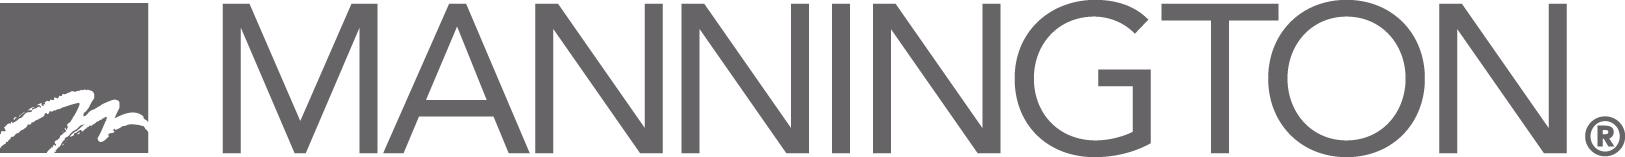 Mannington logo - click to open web site